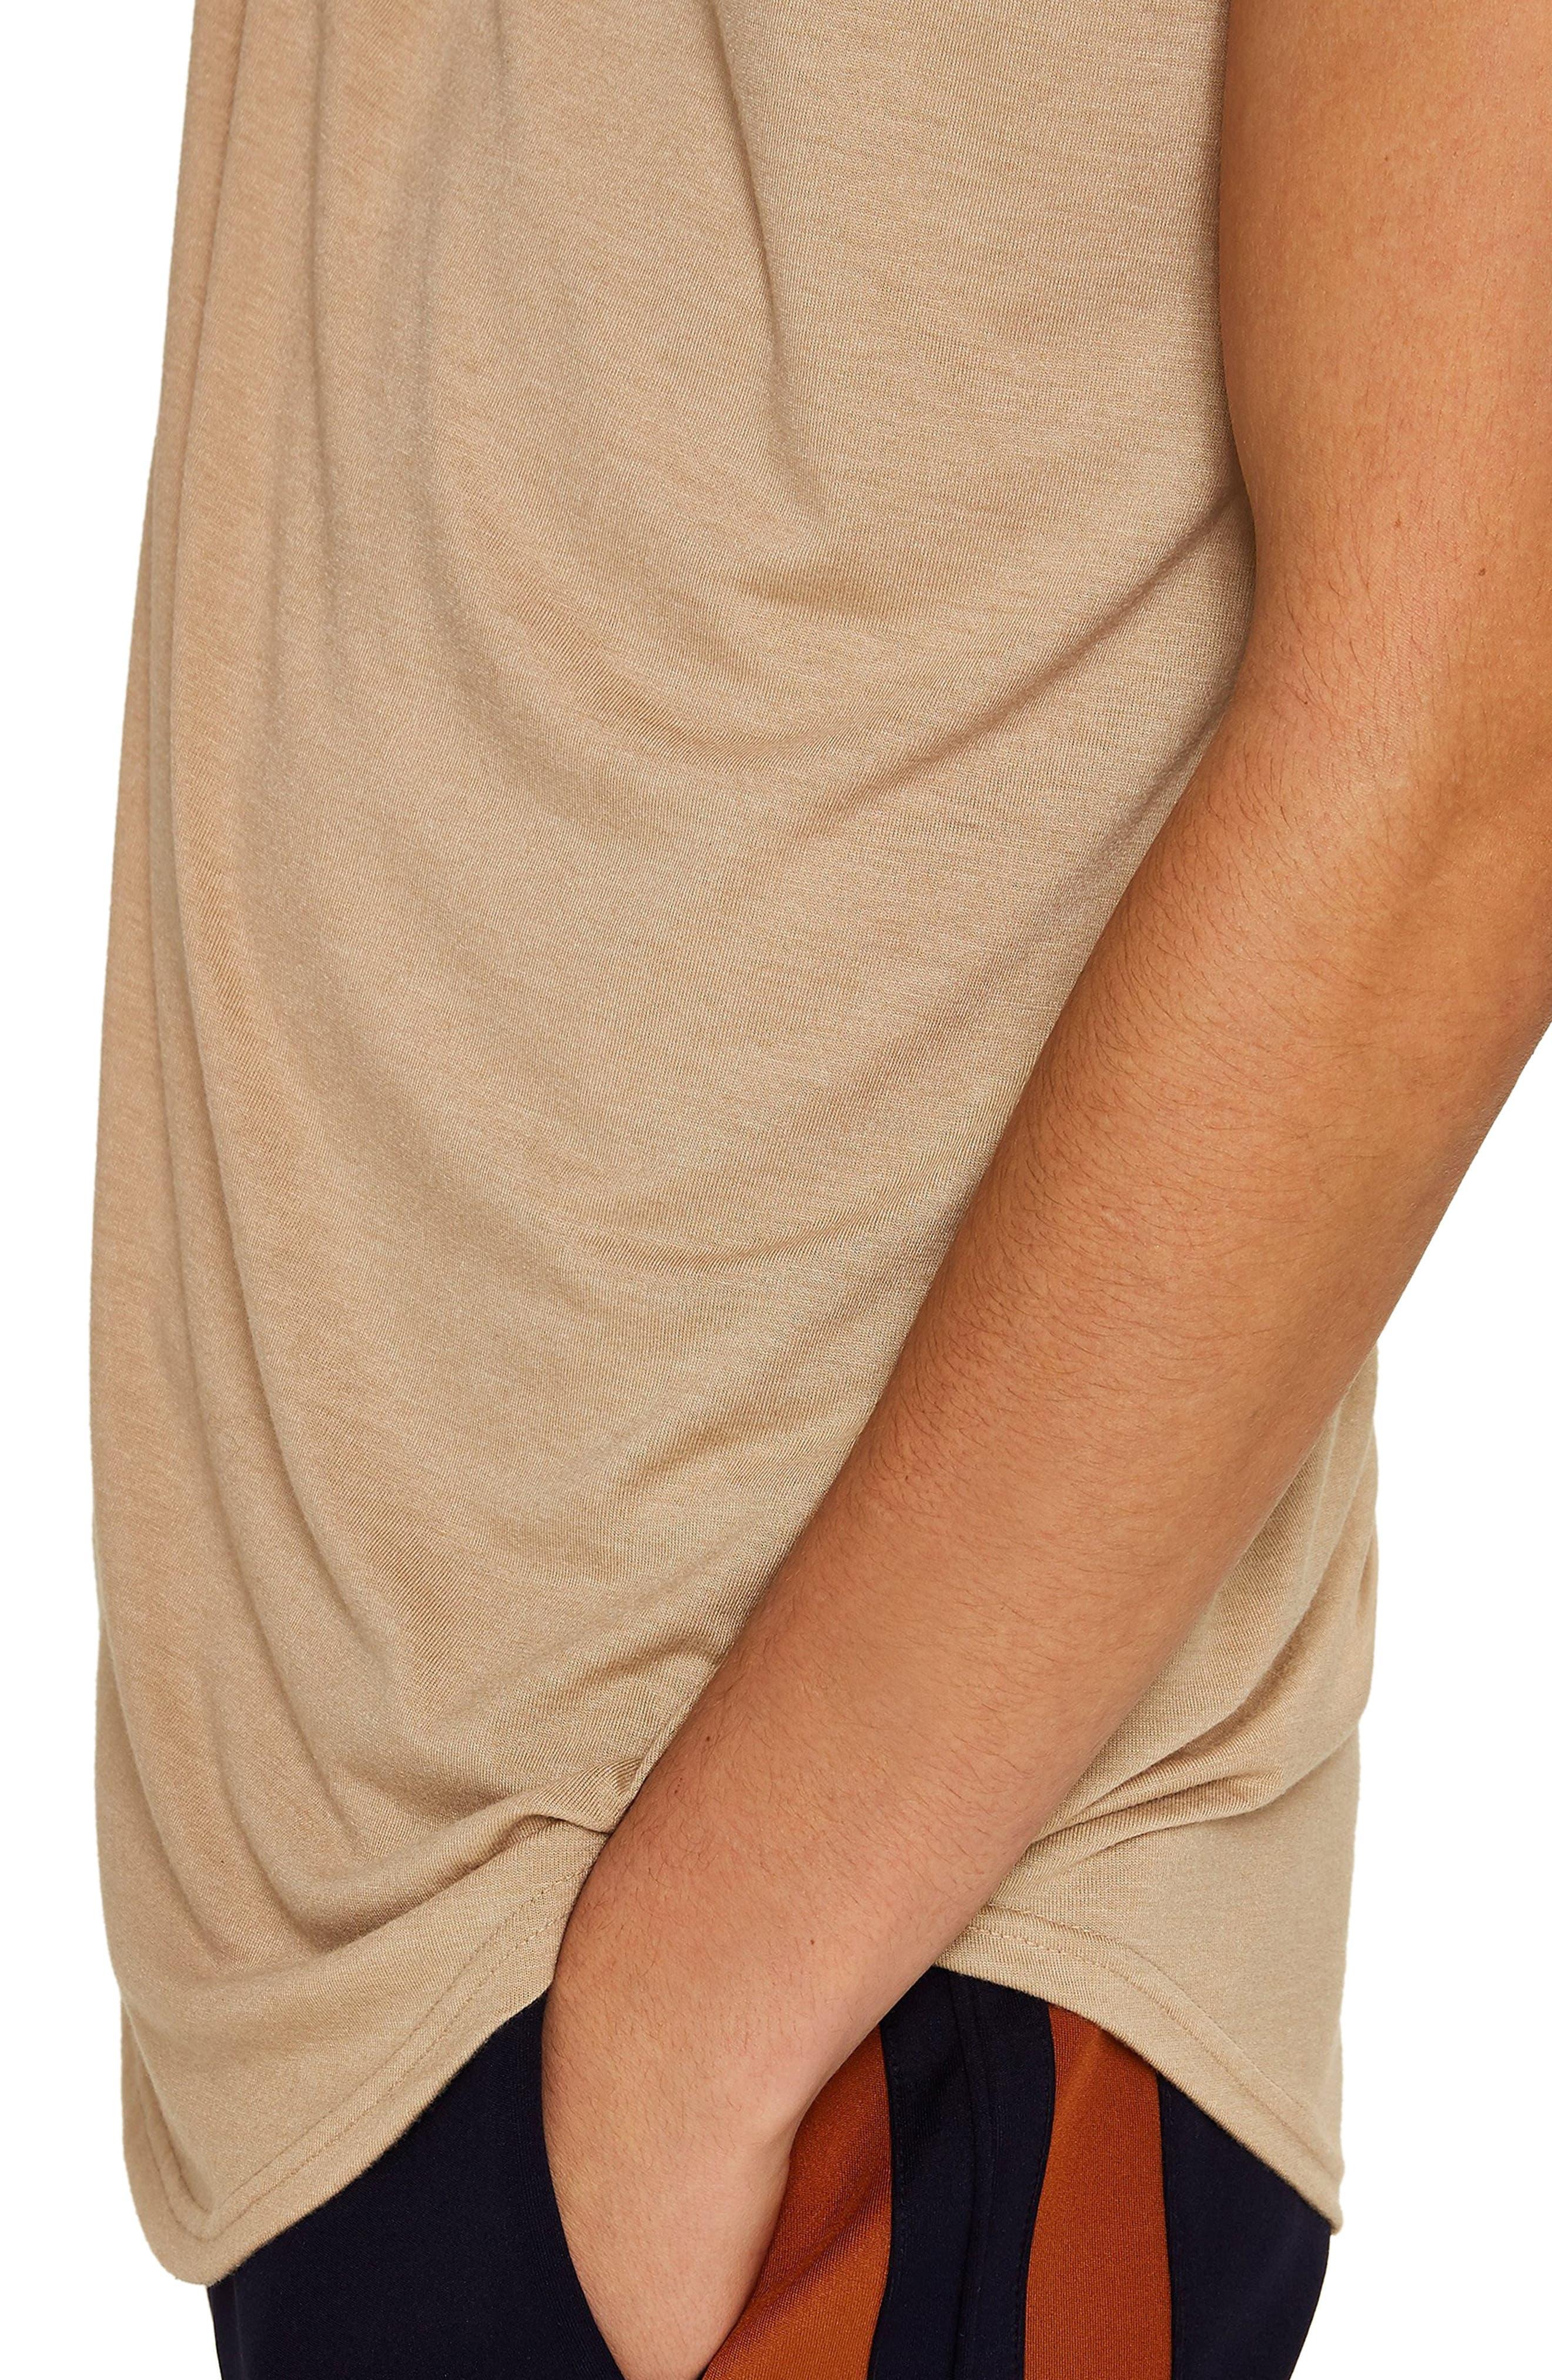 TOPMAN, Scotty Longline T-Shirt, Alternate thumbnail 4, color, STONE